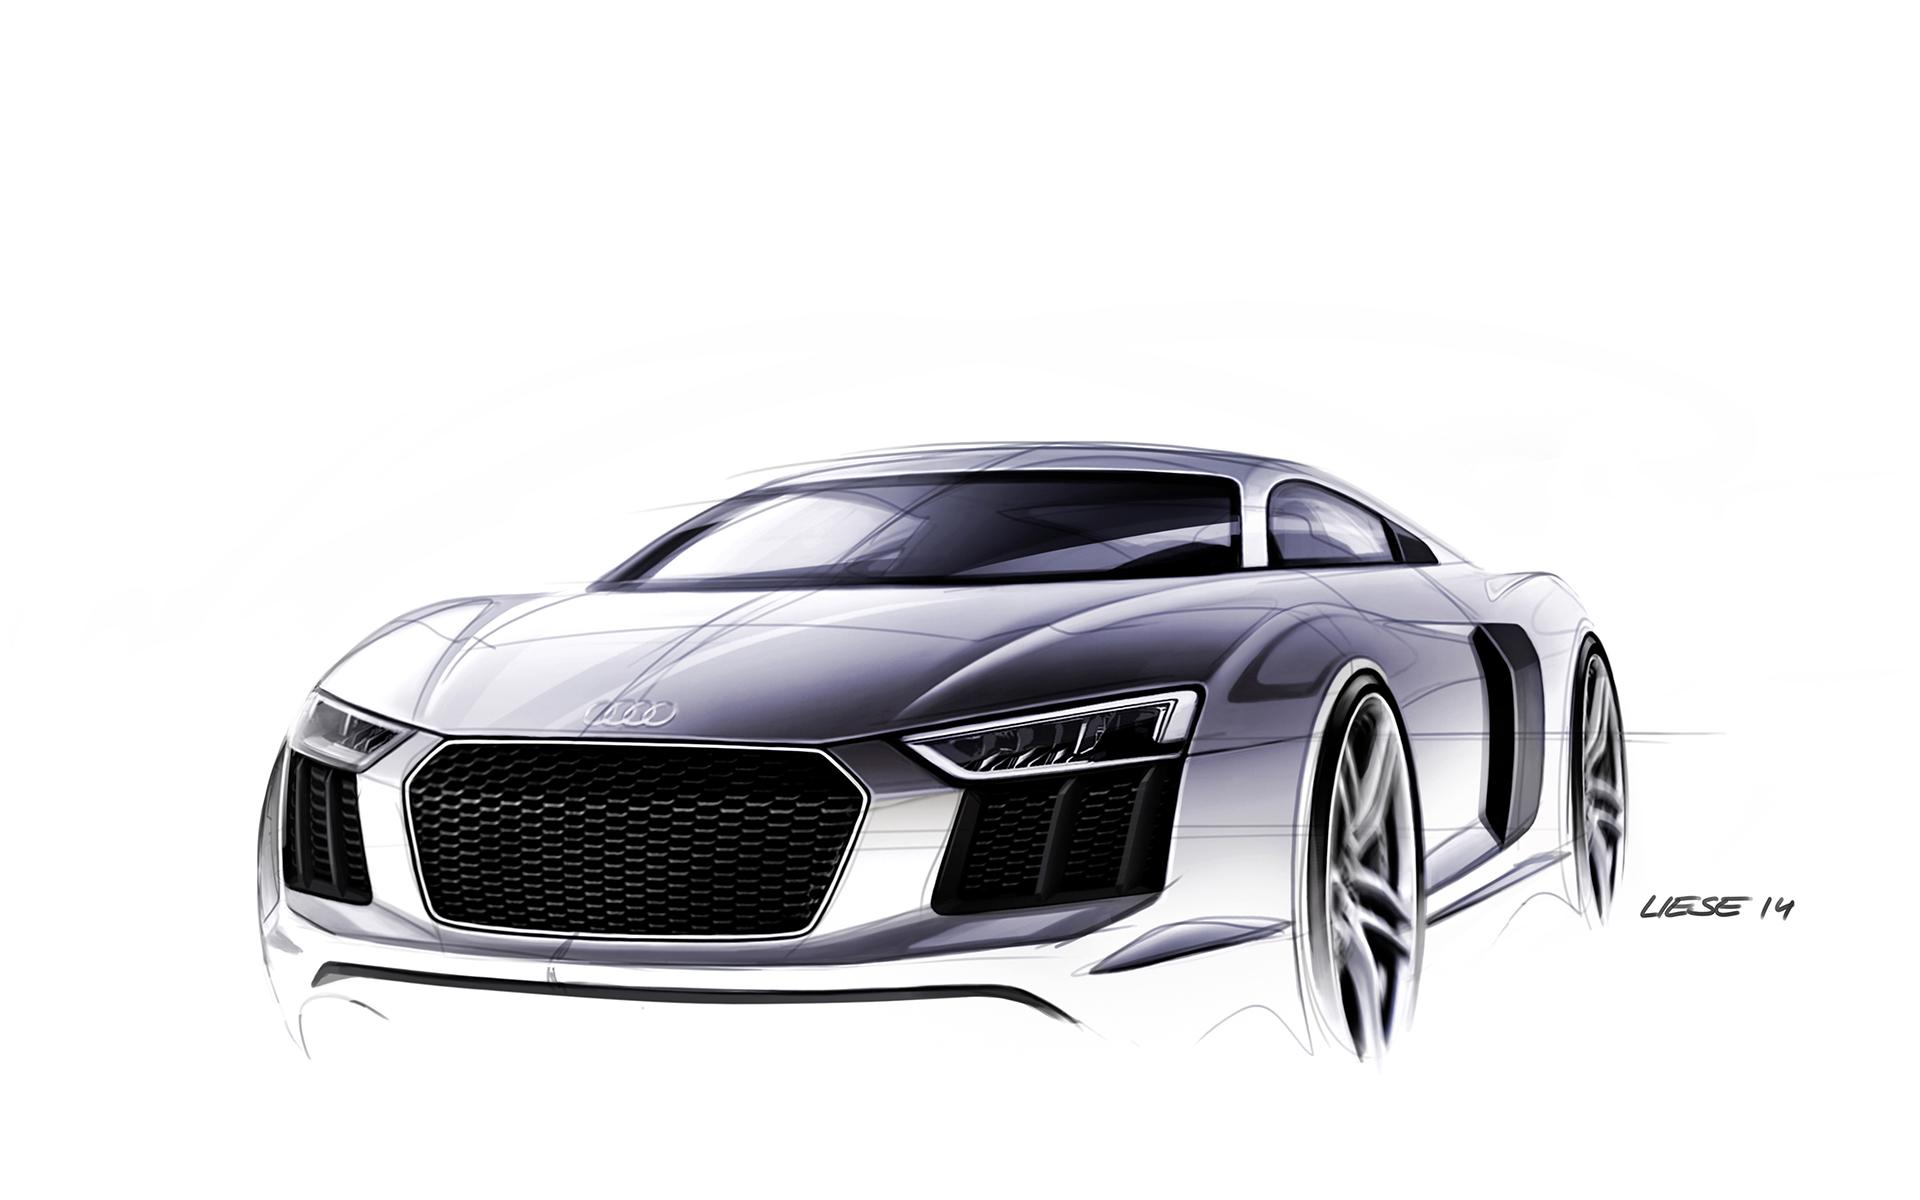 audi-r8-design-sketch.jpg